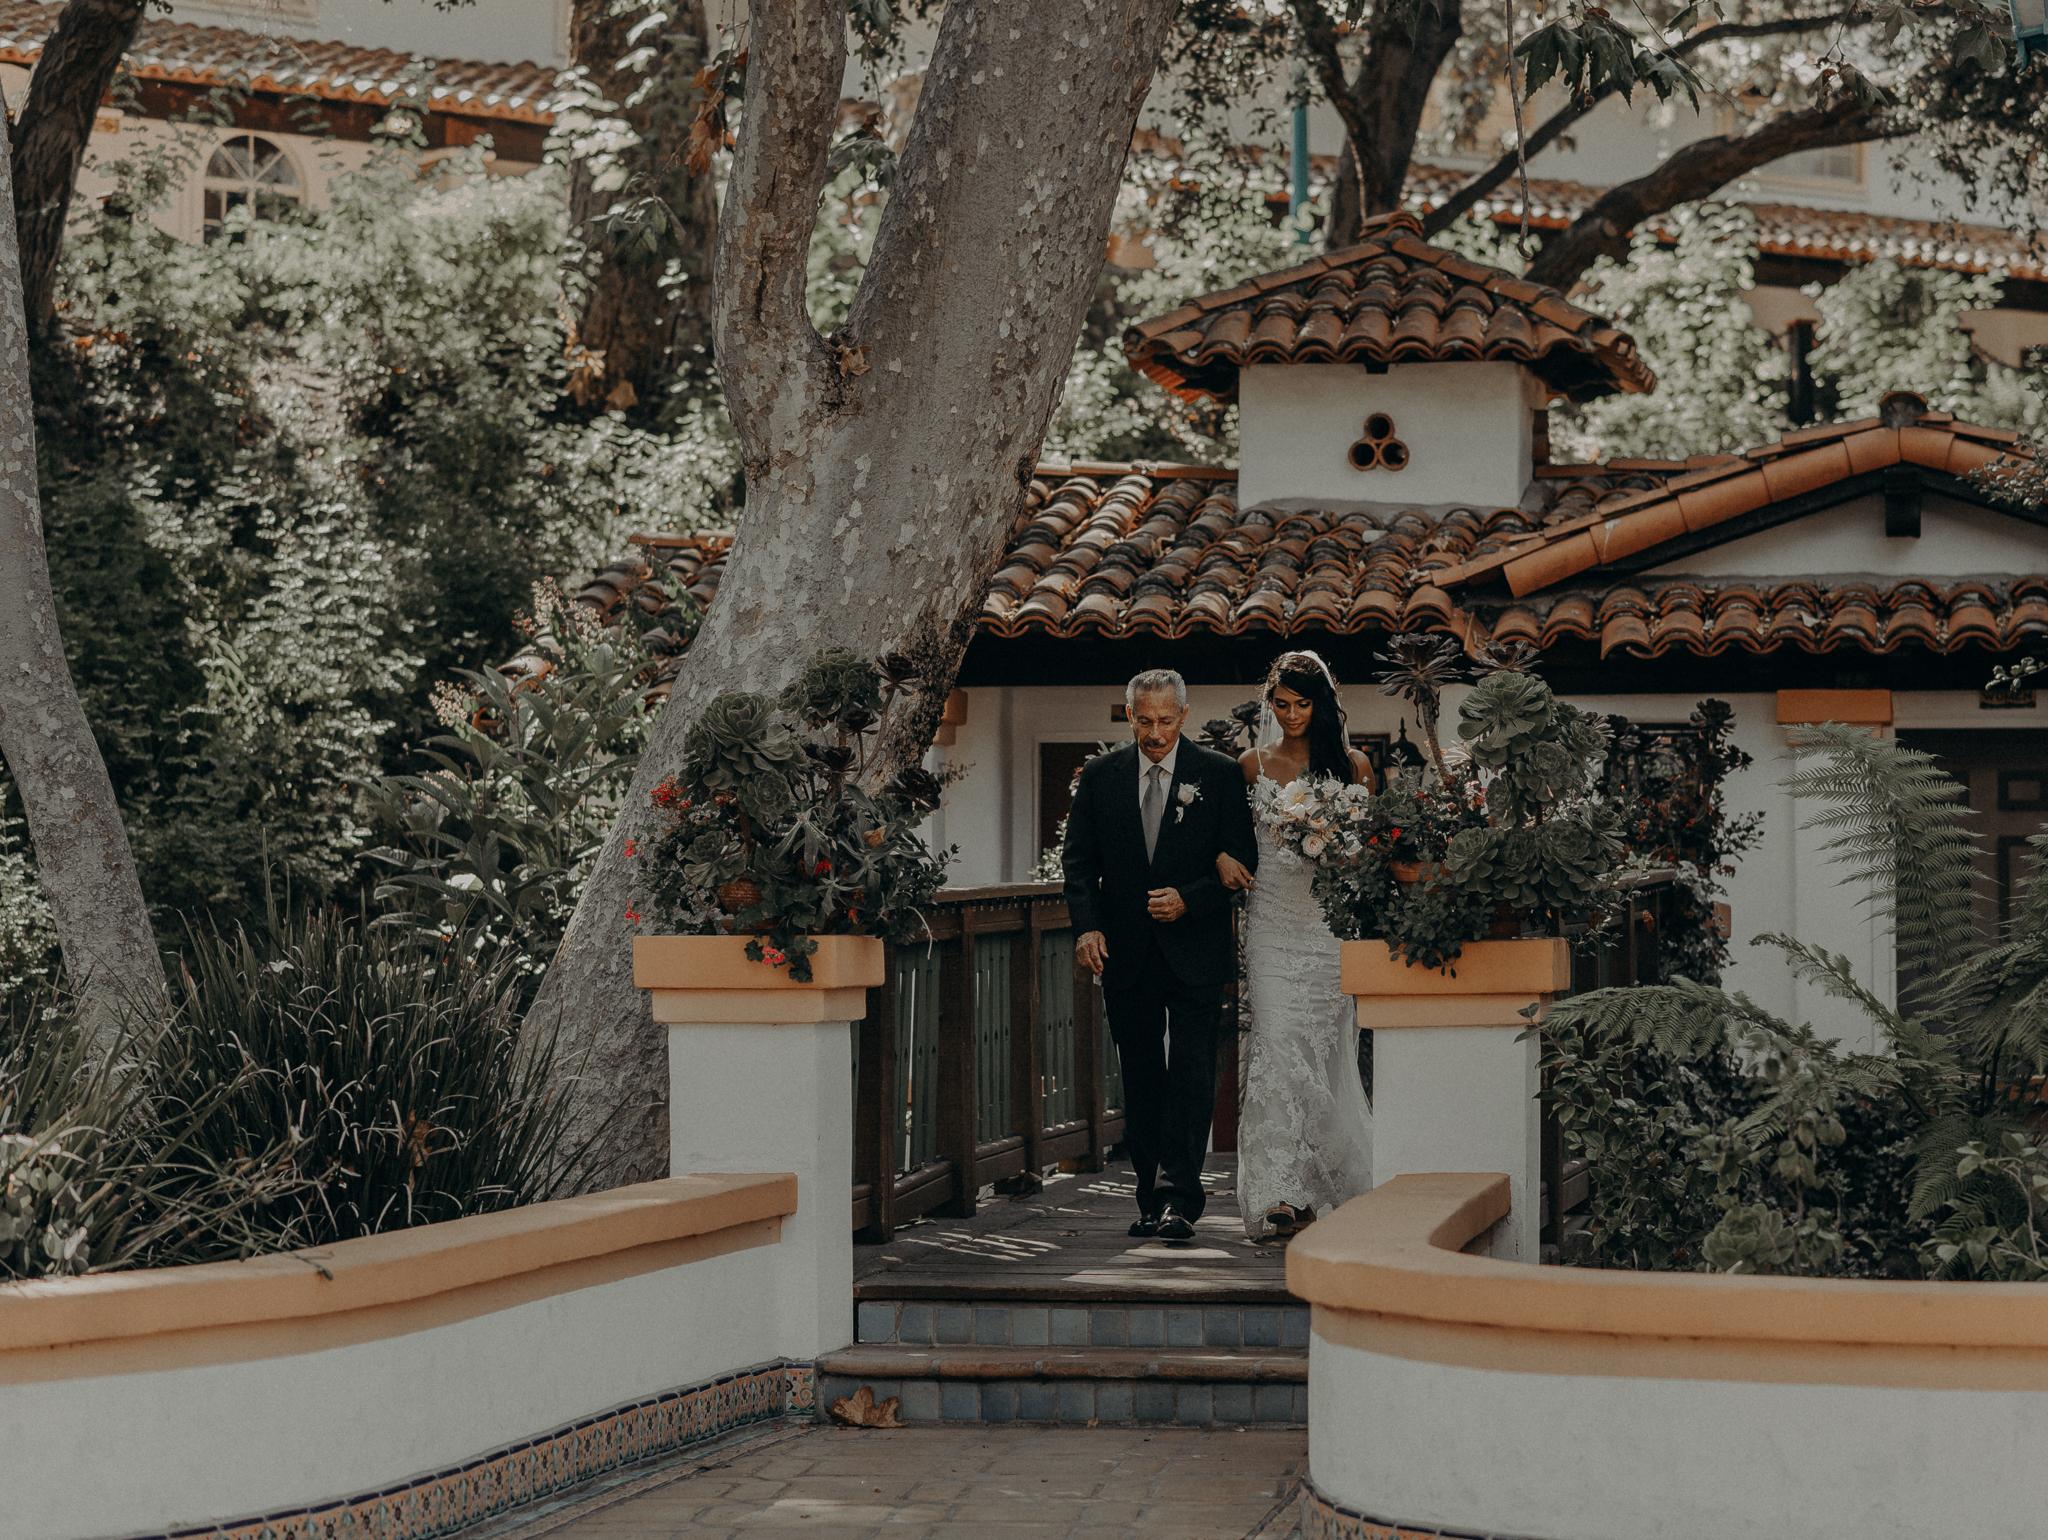 Isaiah + Taylor Photography - Rancho Las Lomas Wedding, Los Angeles Wedding Photographer-044.jpg